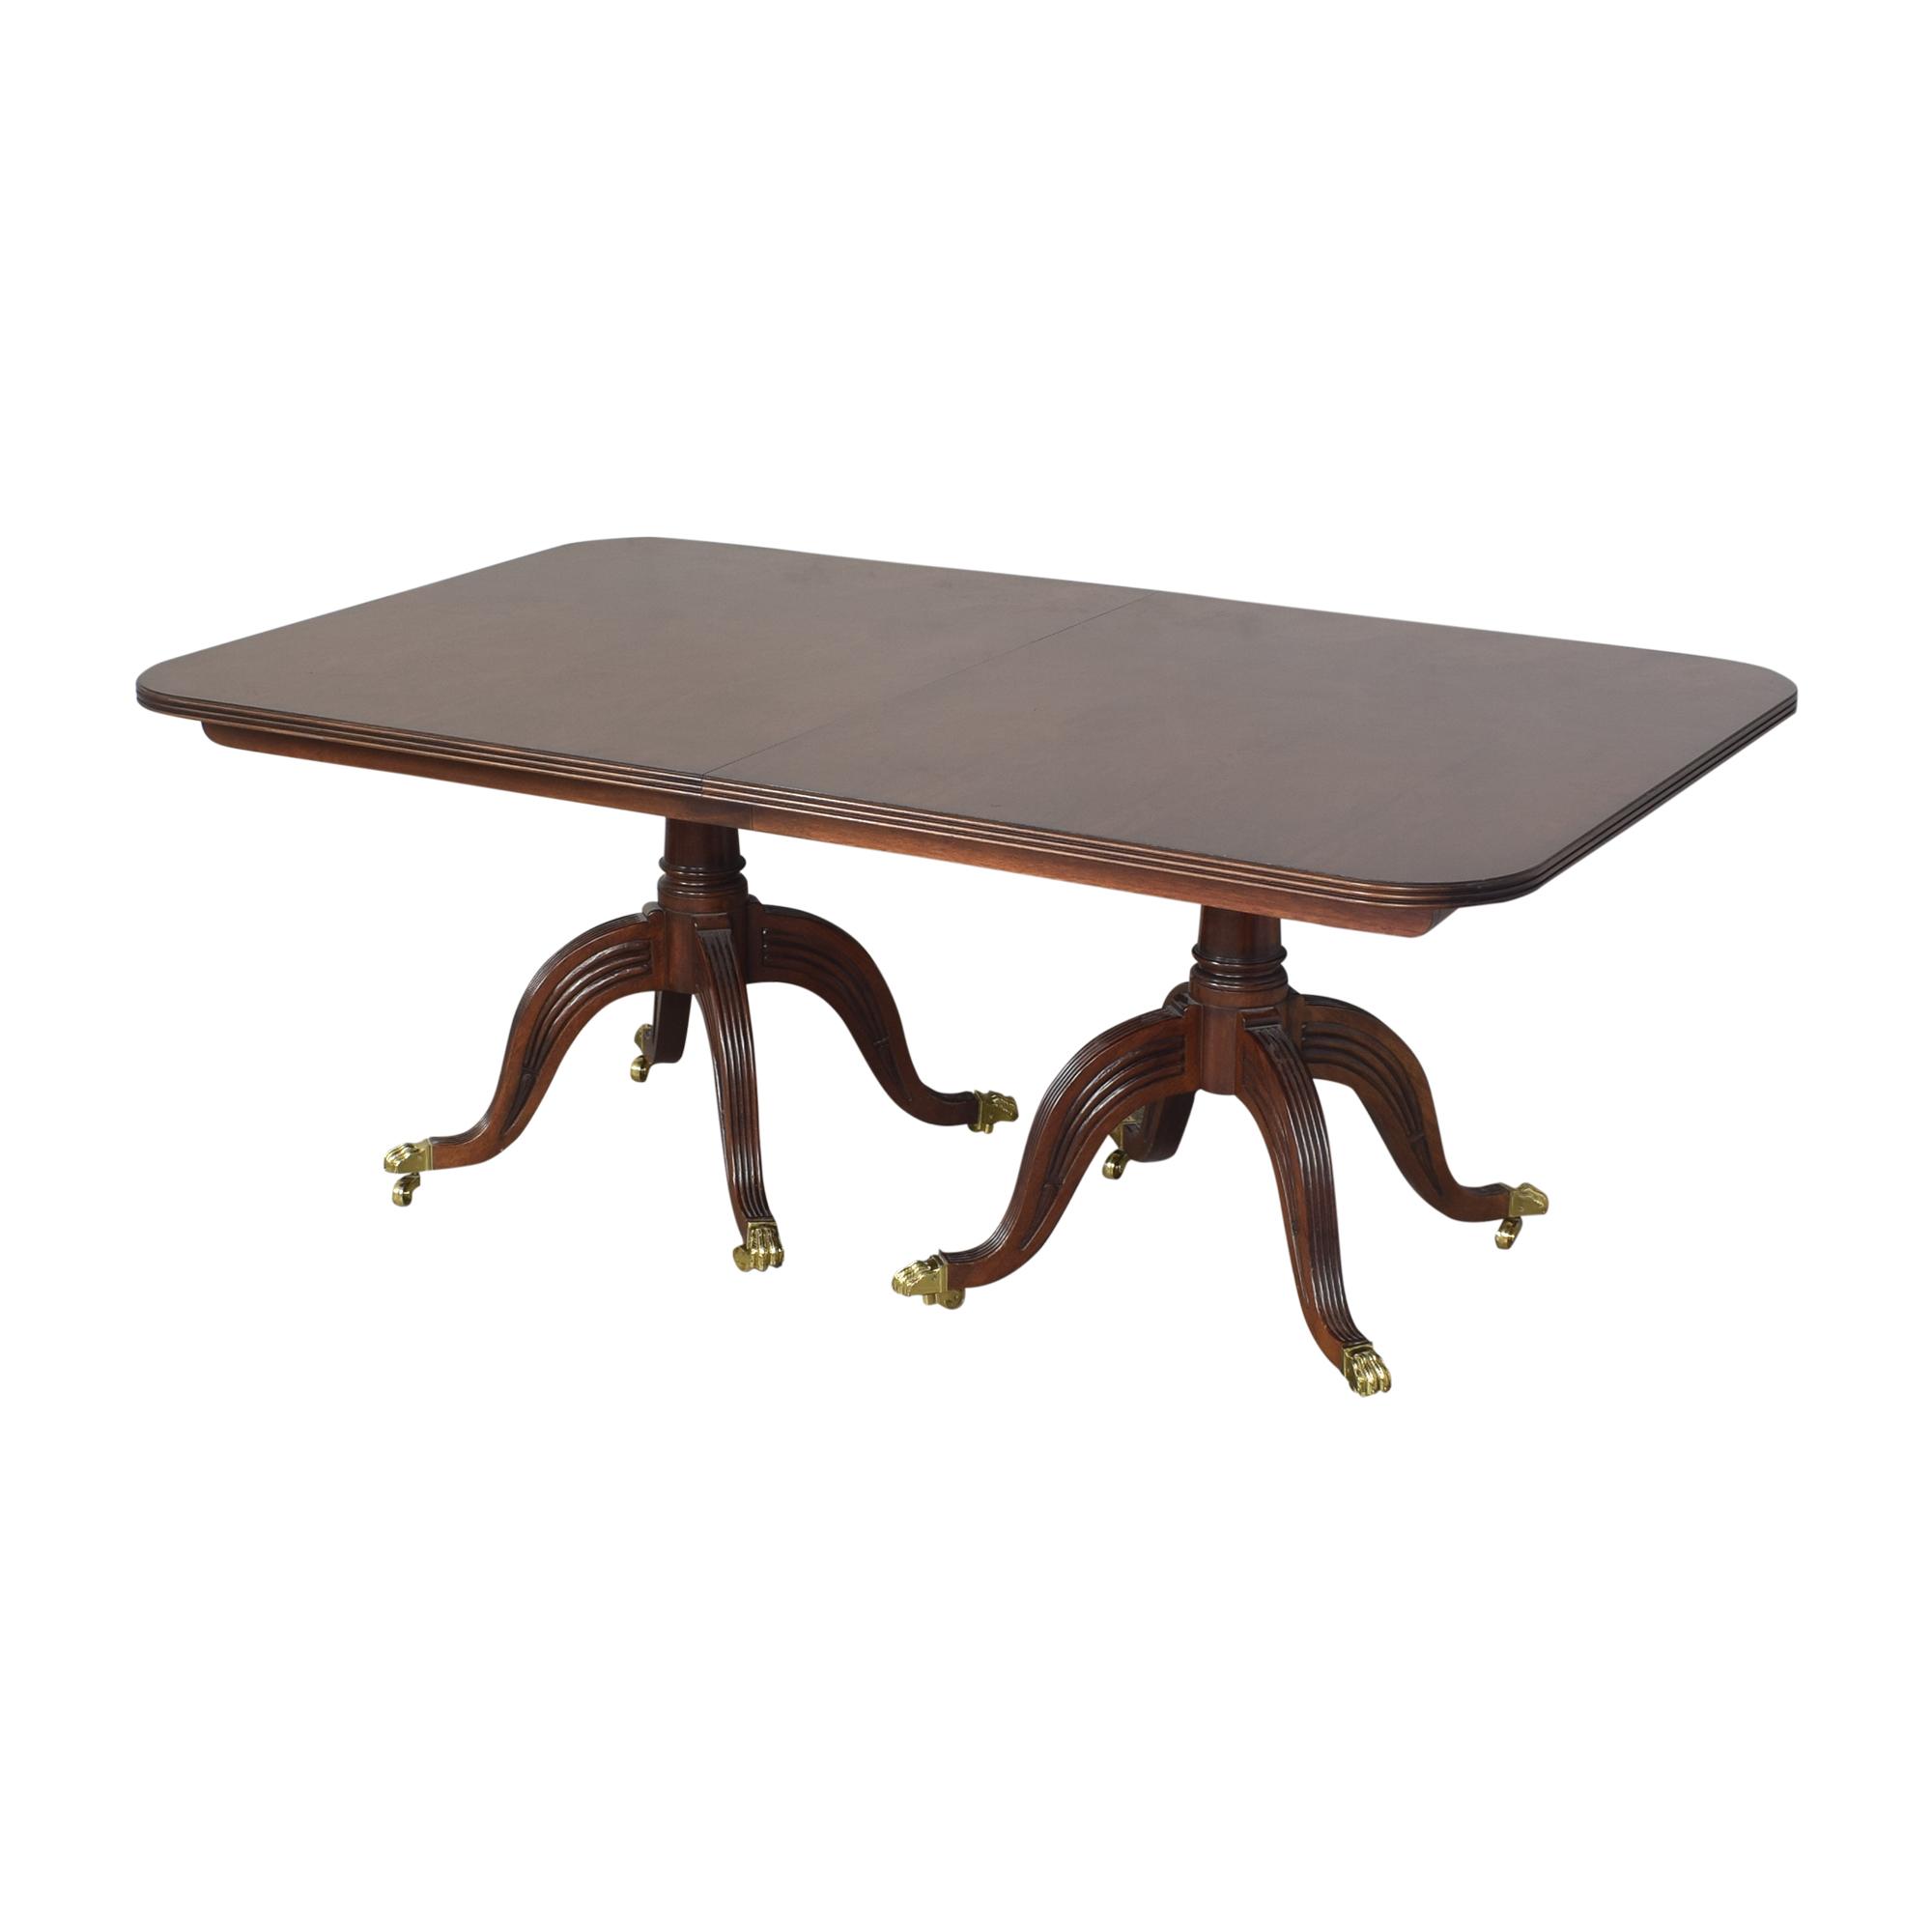 shop Henredon Double Pedestal Extendable Dining Table Henredon Furniture Tables